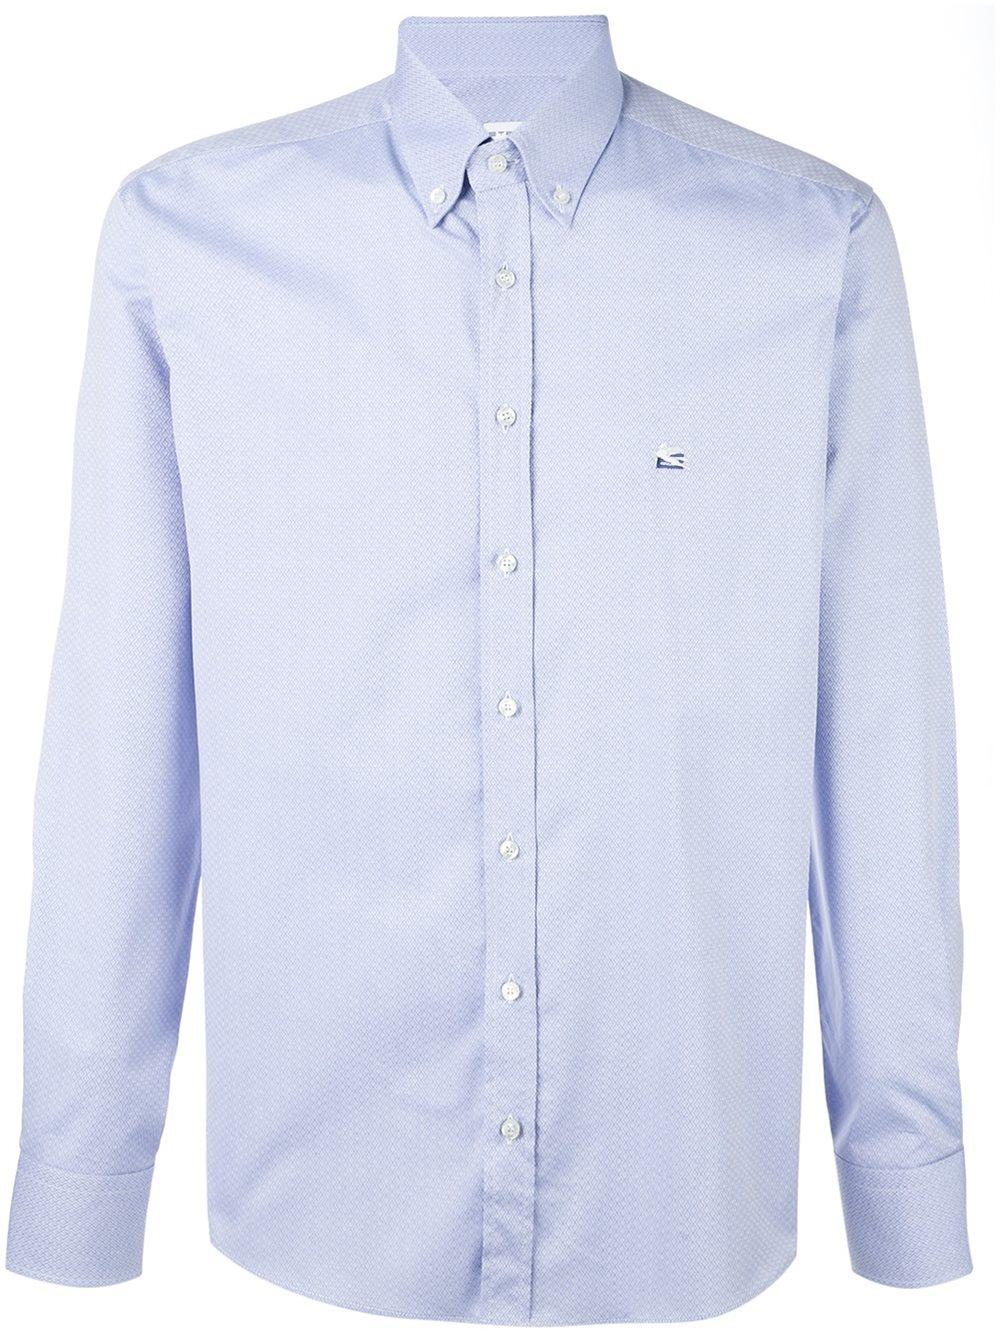 Lyst etro plain shirt in blue for men for Etro men s shirts